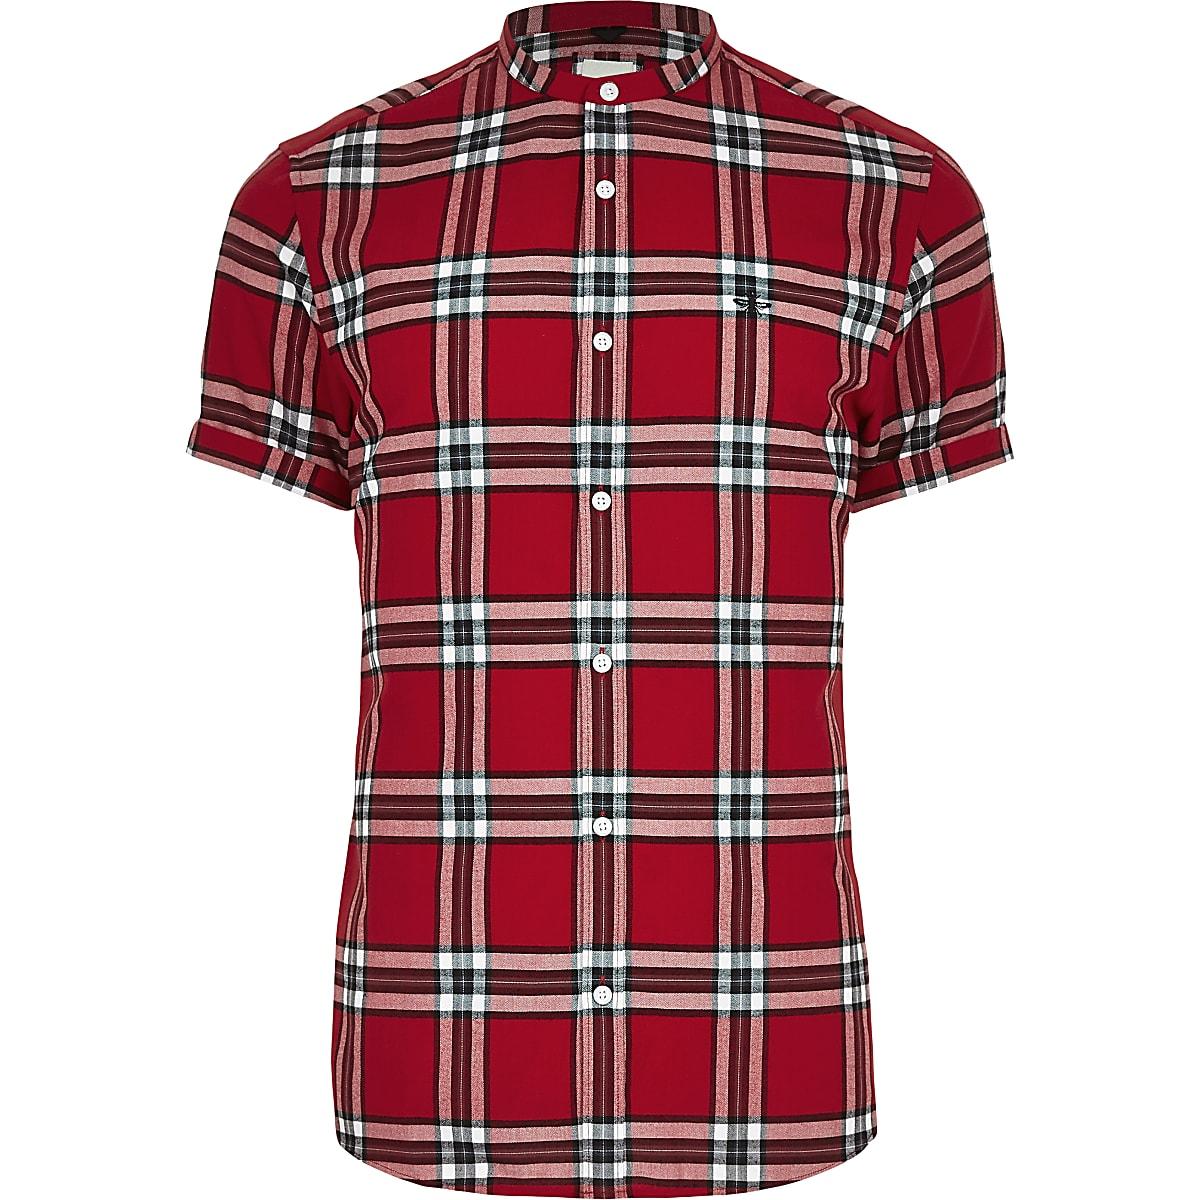 Rood Overhemd Slim Fit.Rood Geruit Slim Fit Overhemd Zonder Kraag Overhemden Met Korte